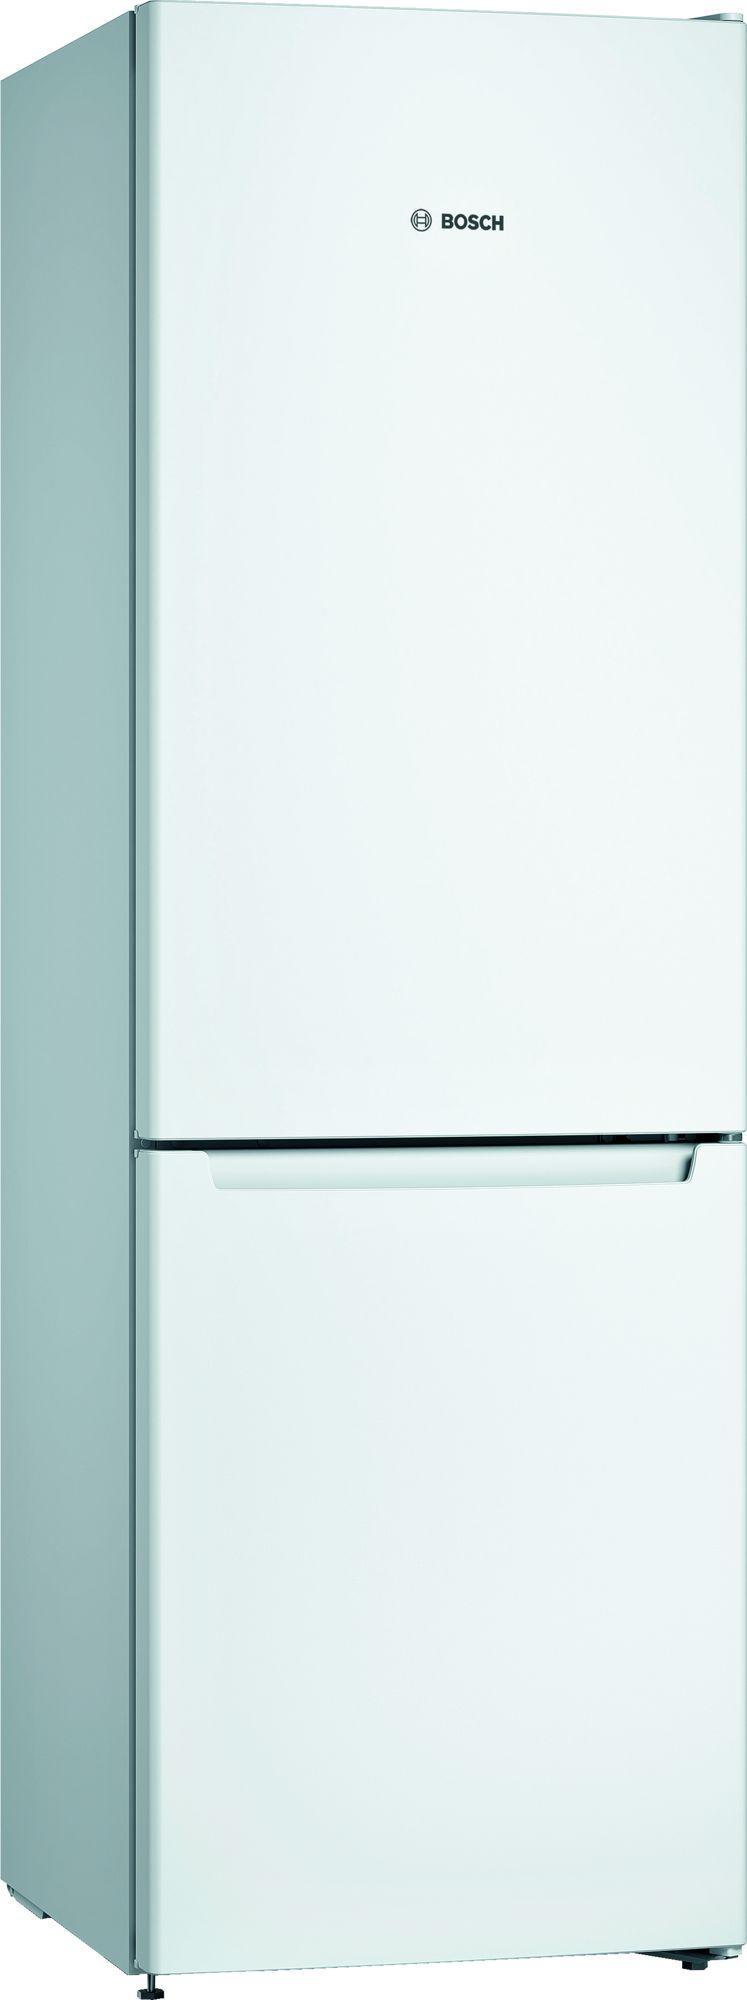 Image of Serie 2 KGN36NWEAG 60cm 302 Litre No Frost Fridge Freezer   White